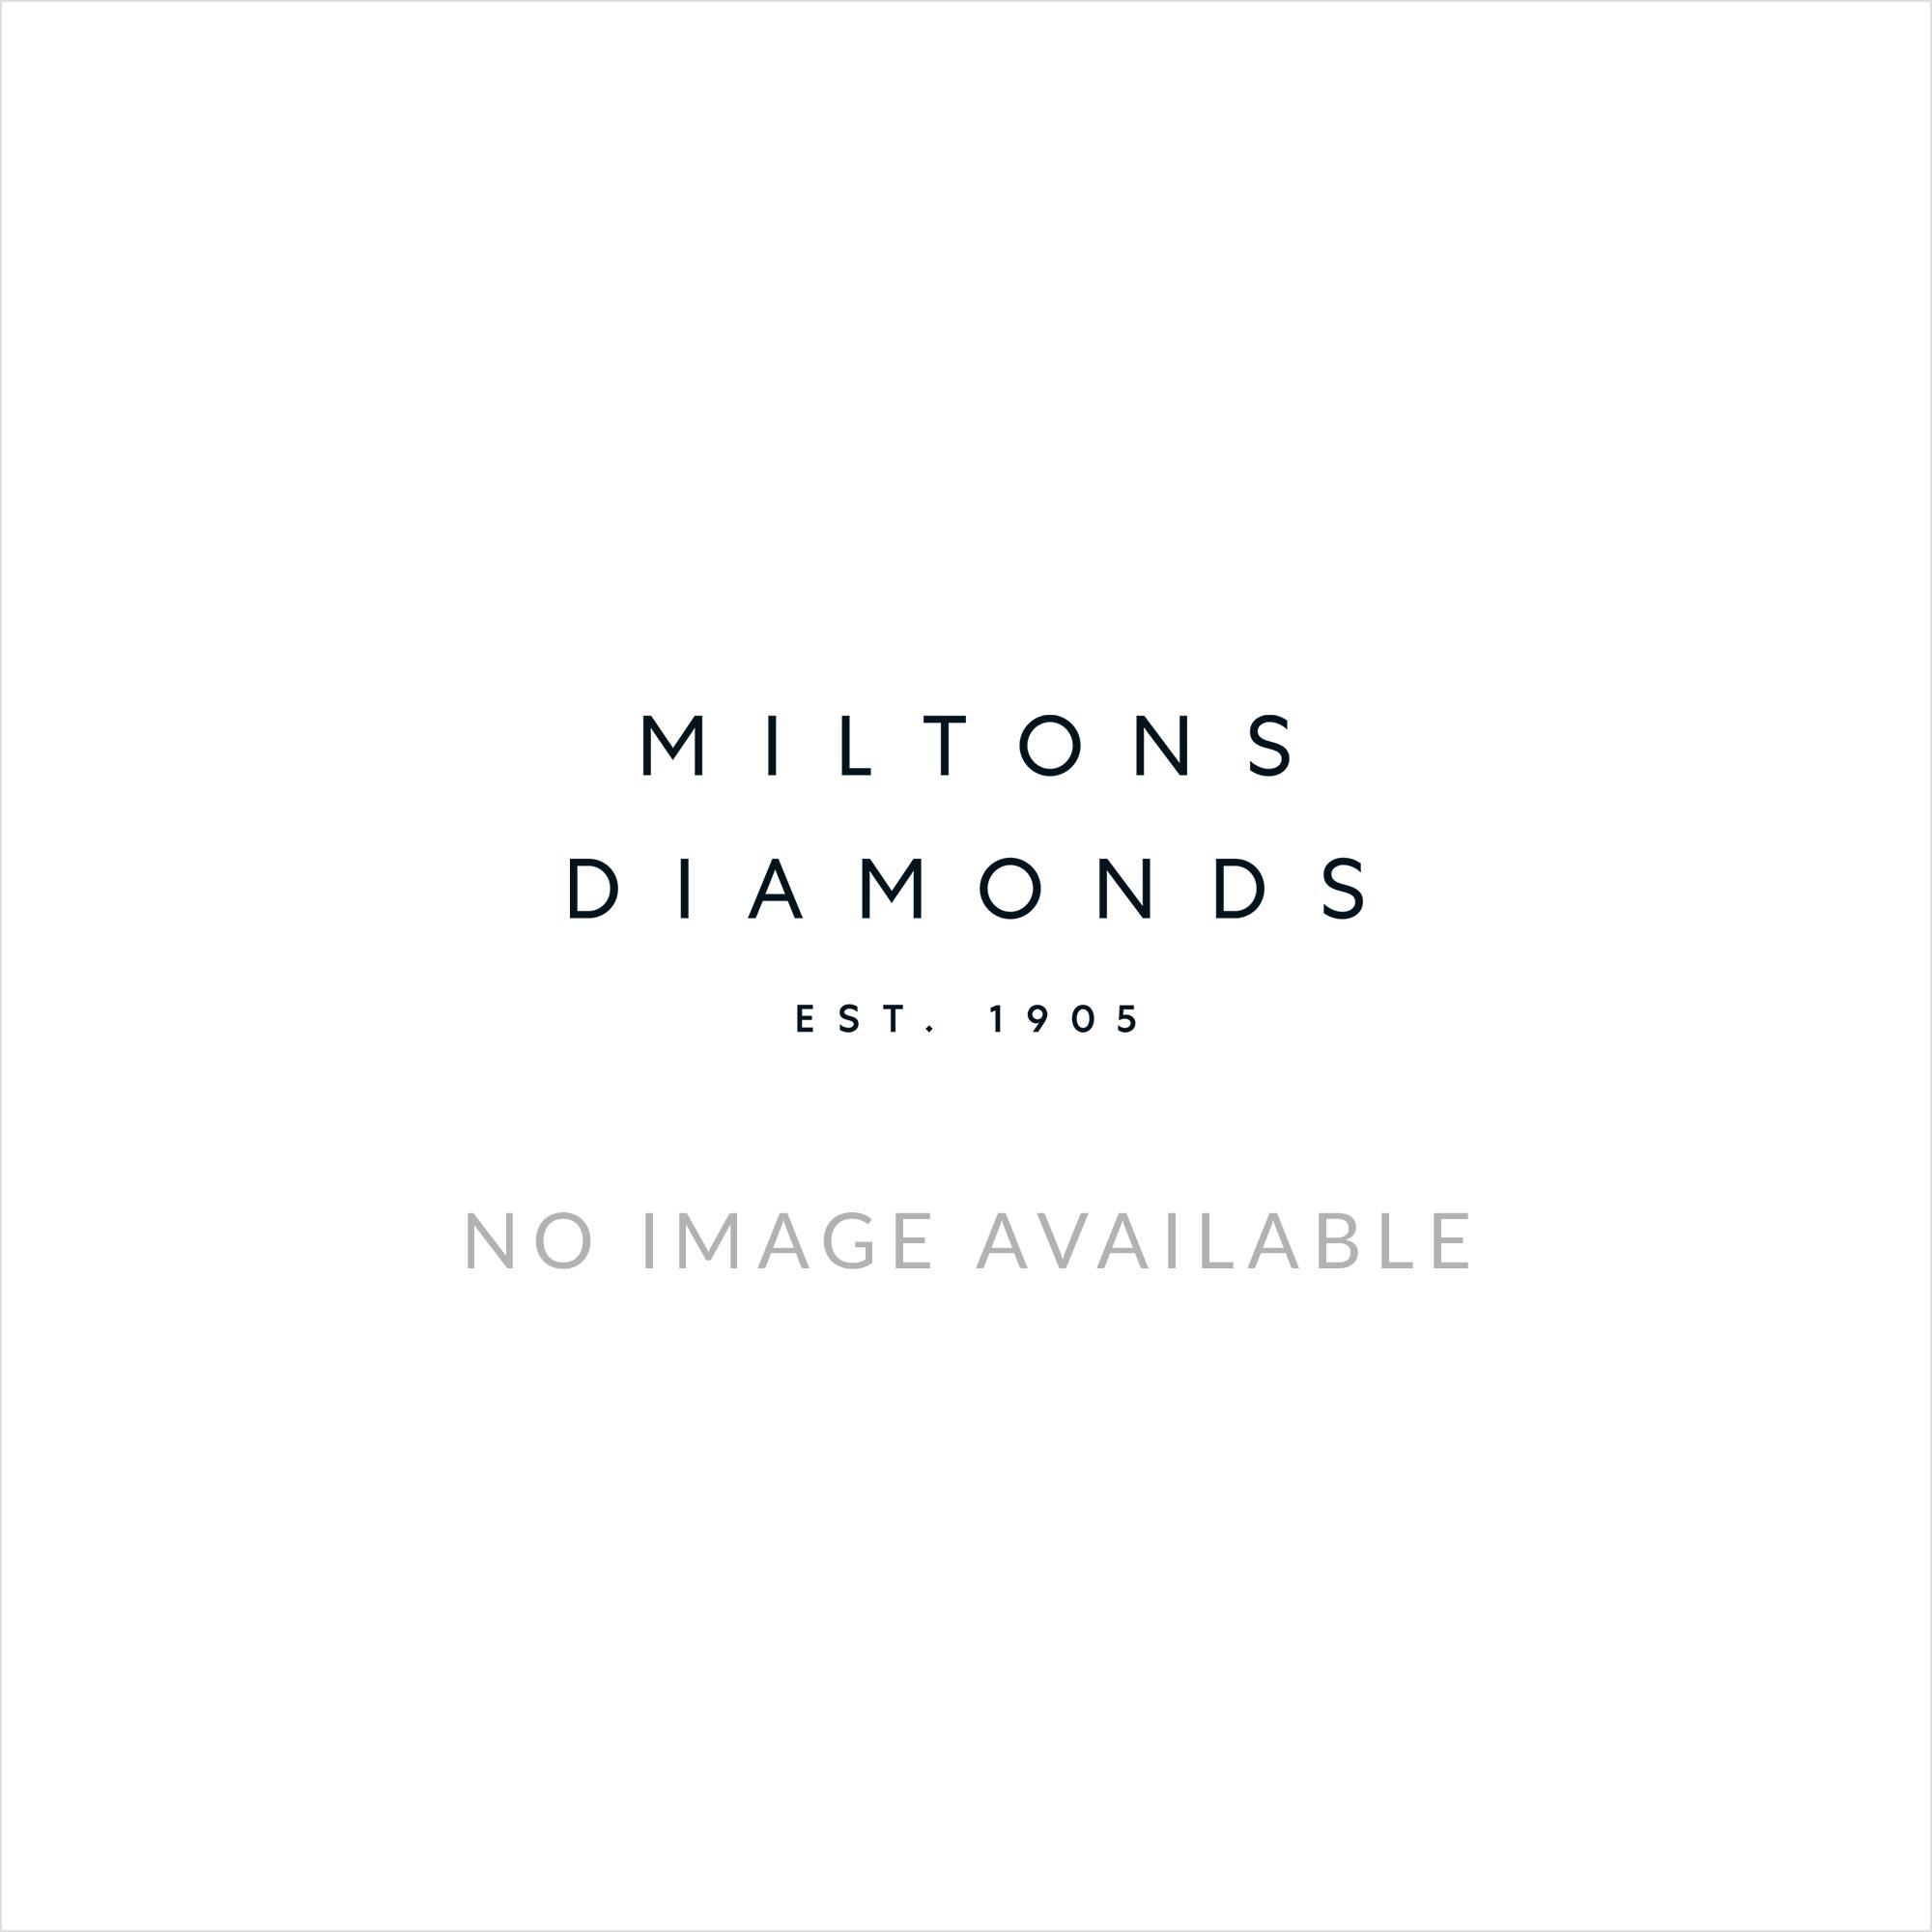 P1 P2 Diamond: Very Large Diamond Engagement Ring 5.02ct Set In Platinum